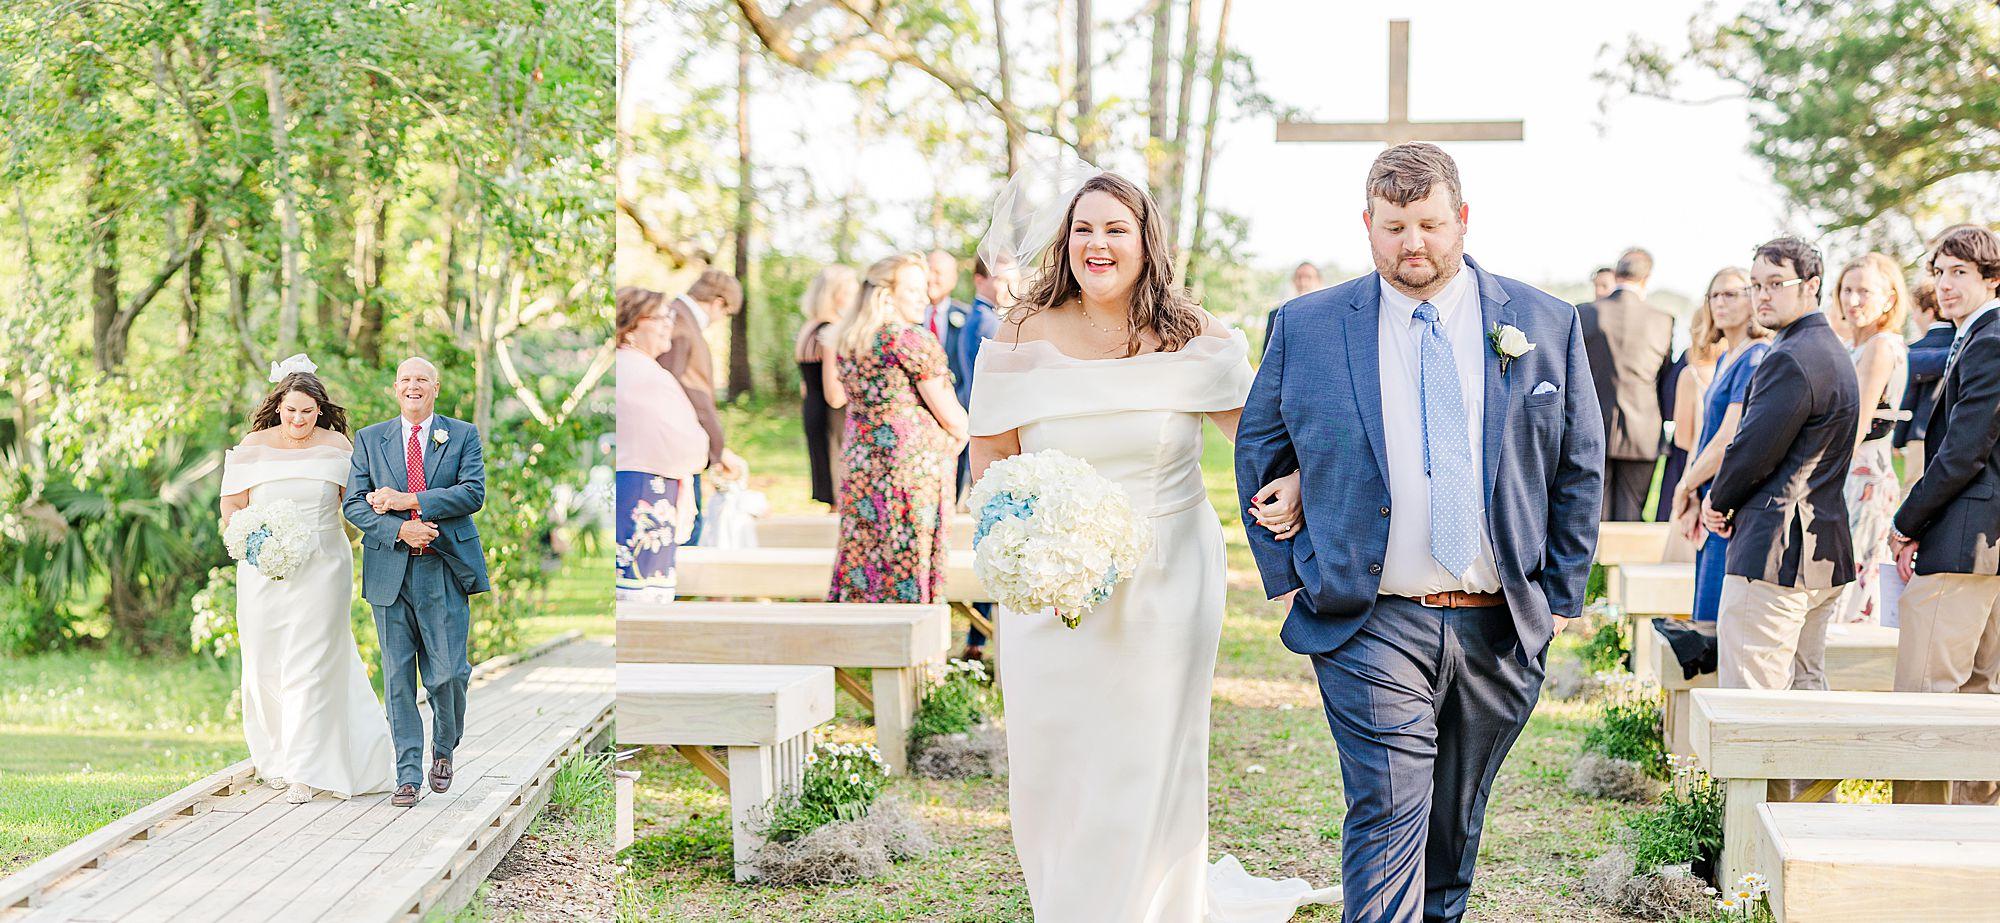 wedding ceremony on Dog River in Mobile AL